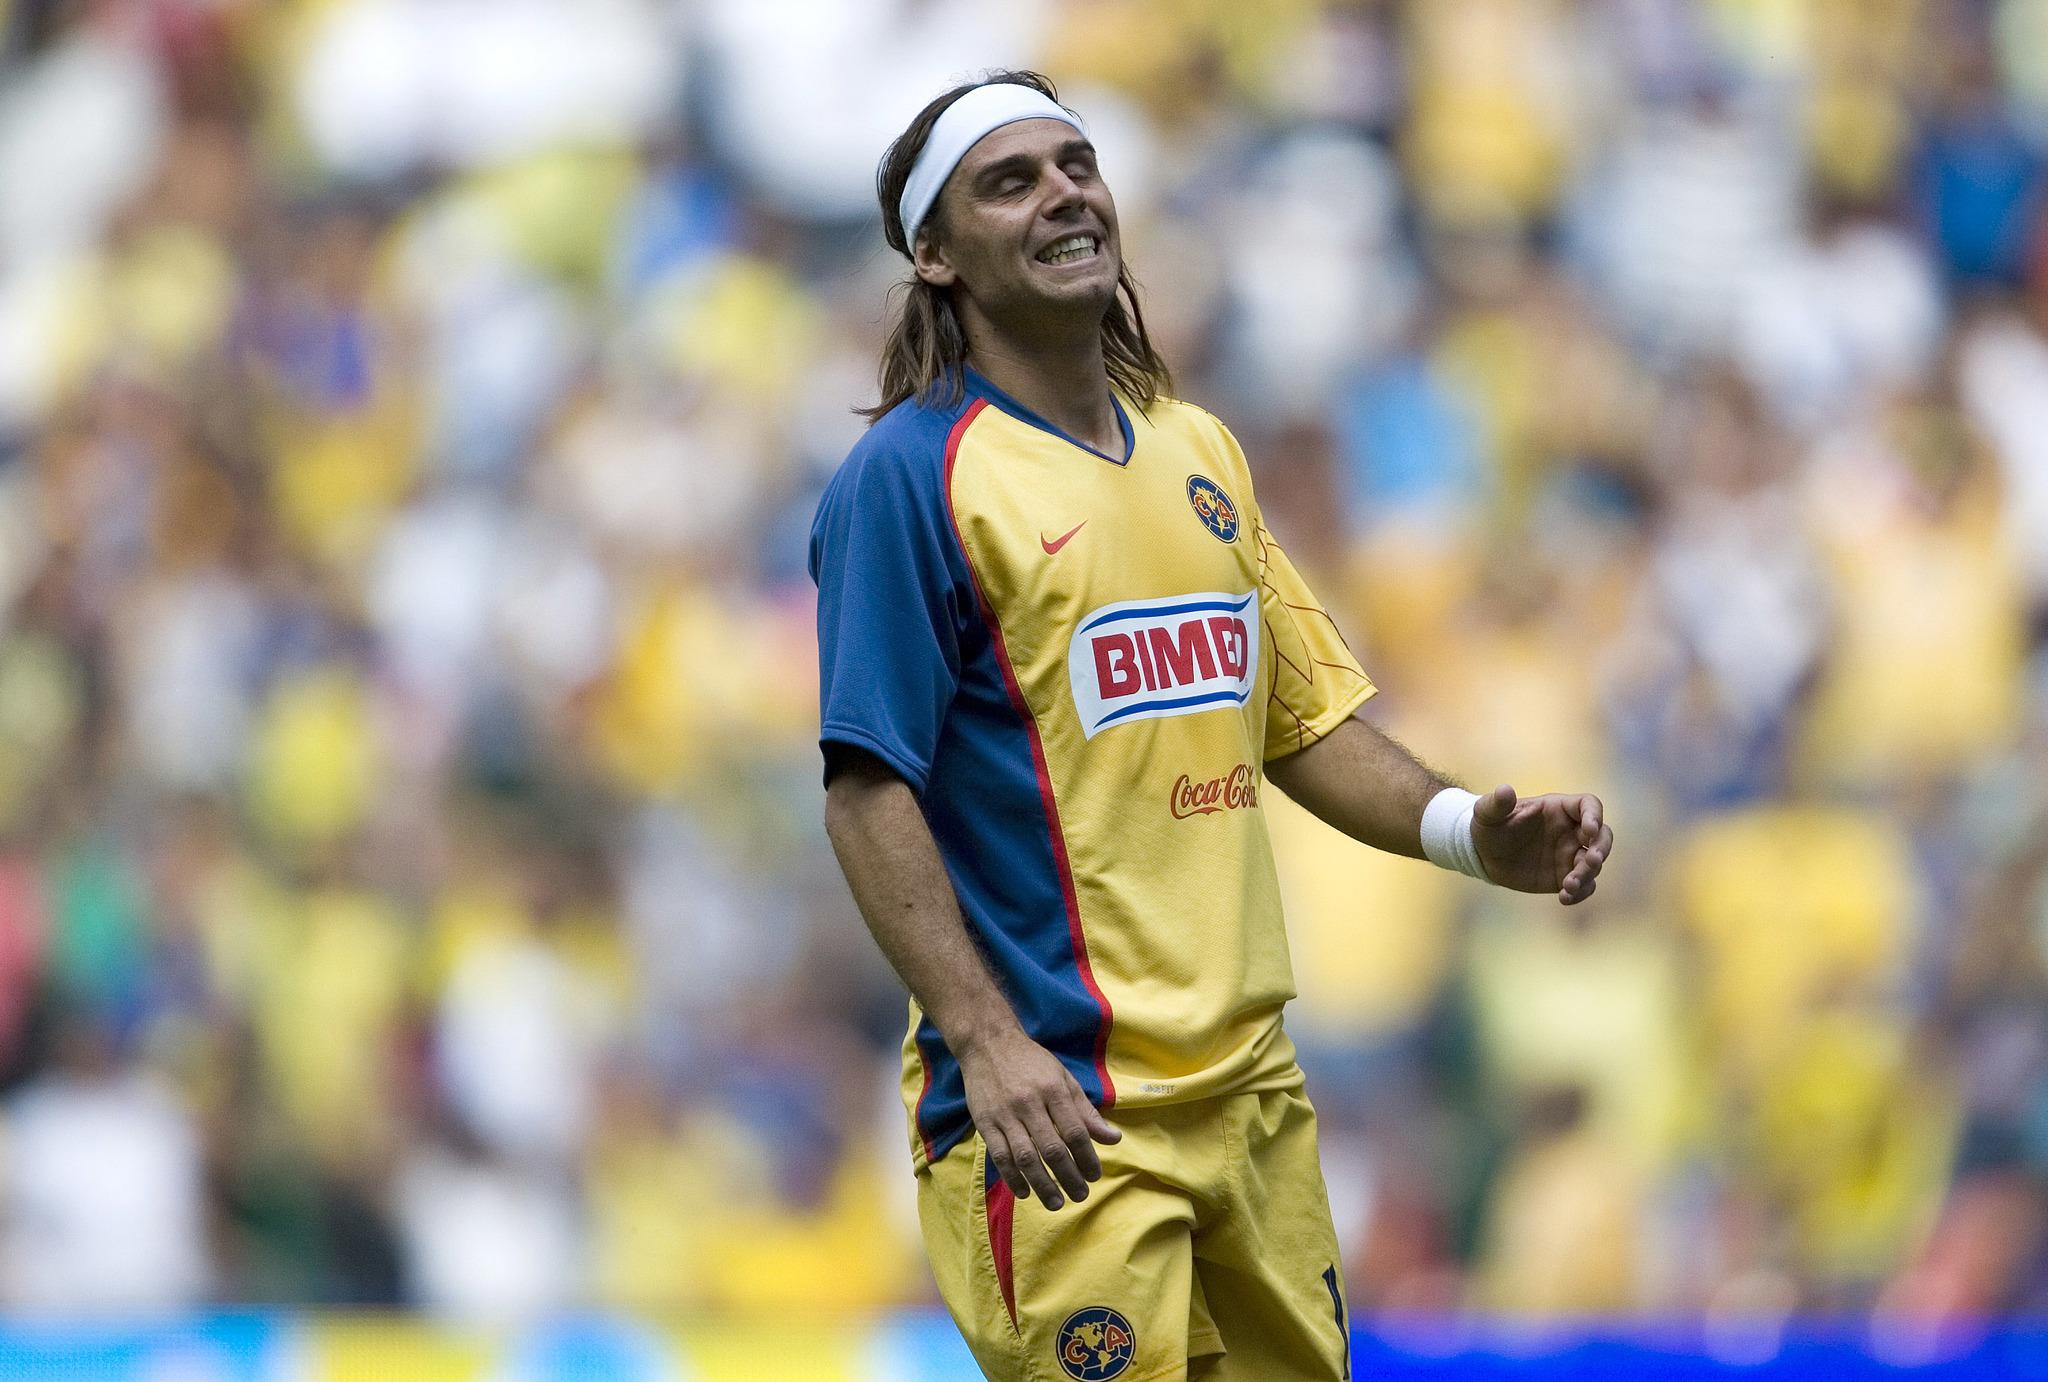 ¿Cuándo se reanudará la Liga MX, Liga Femenil y Ascenso MX?